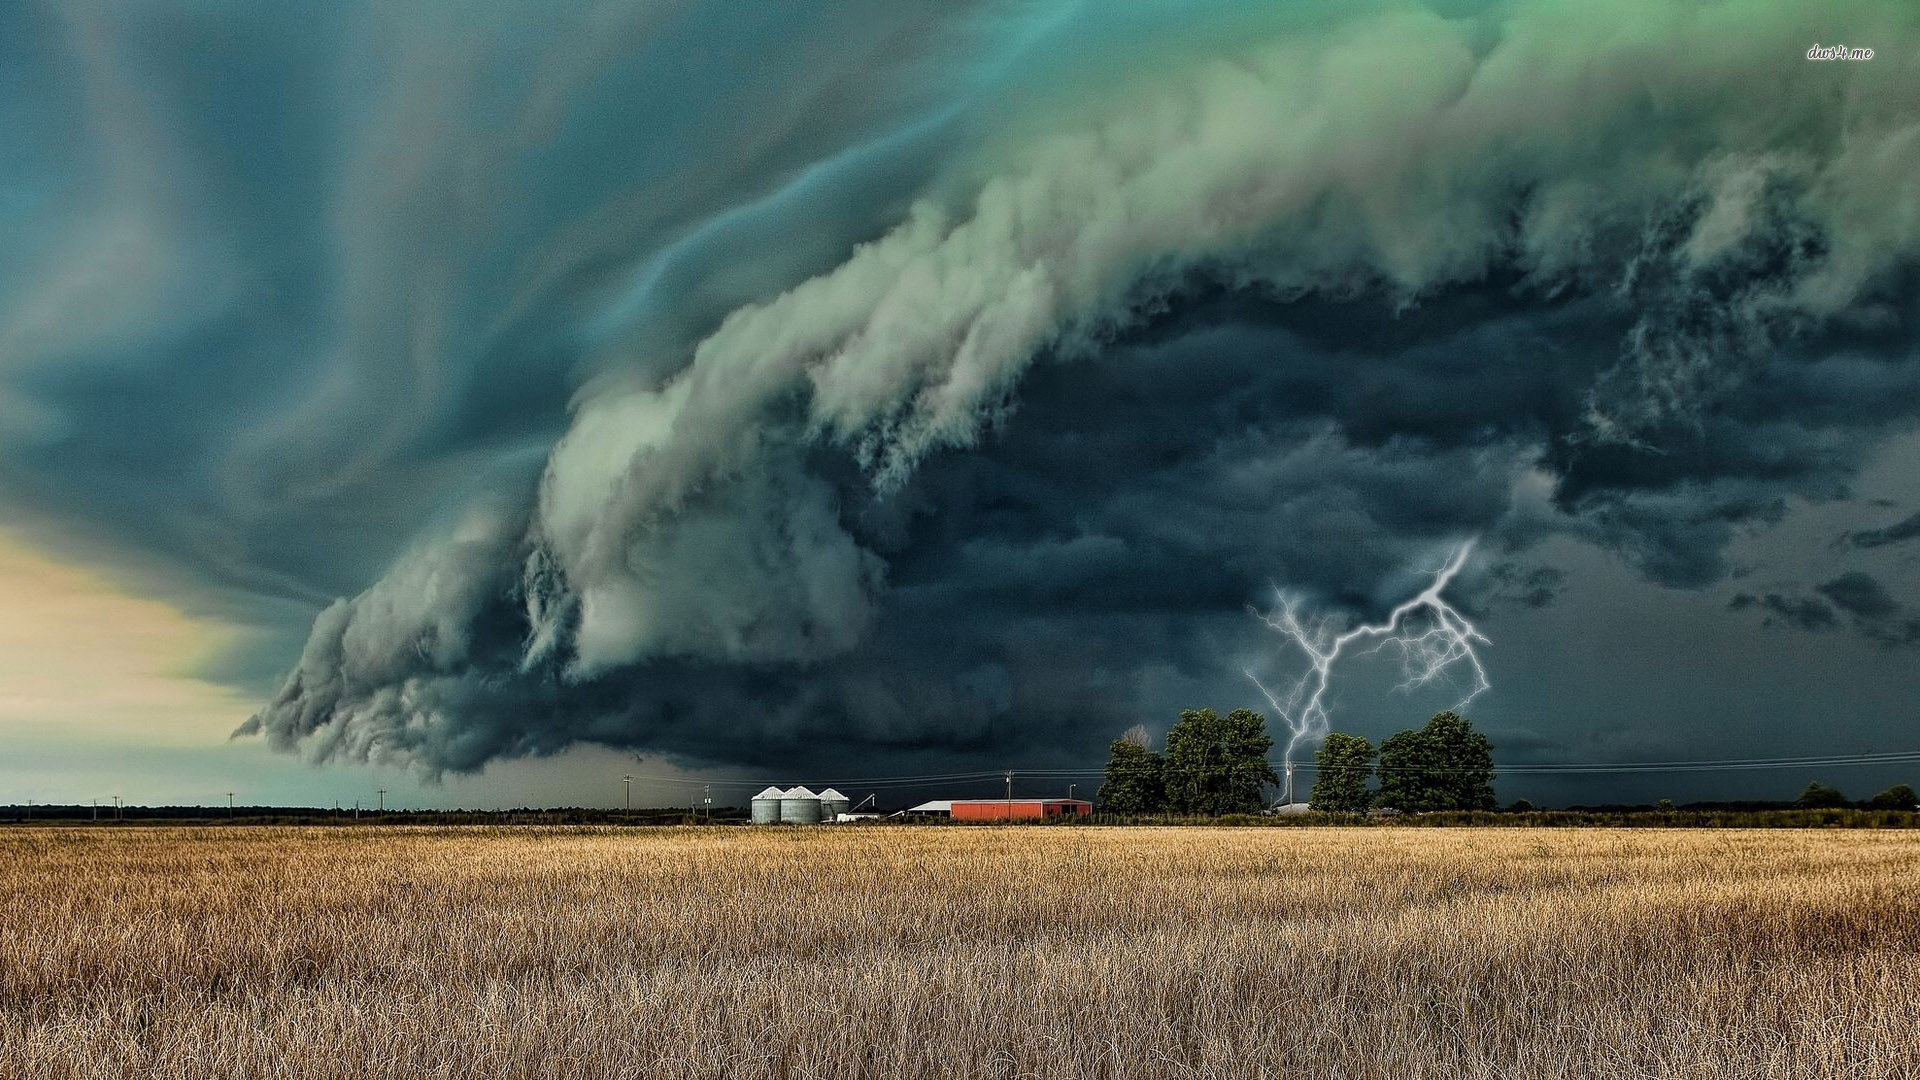 Storm Cloud Desktop Wallpaper (49+ images)